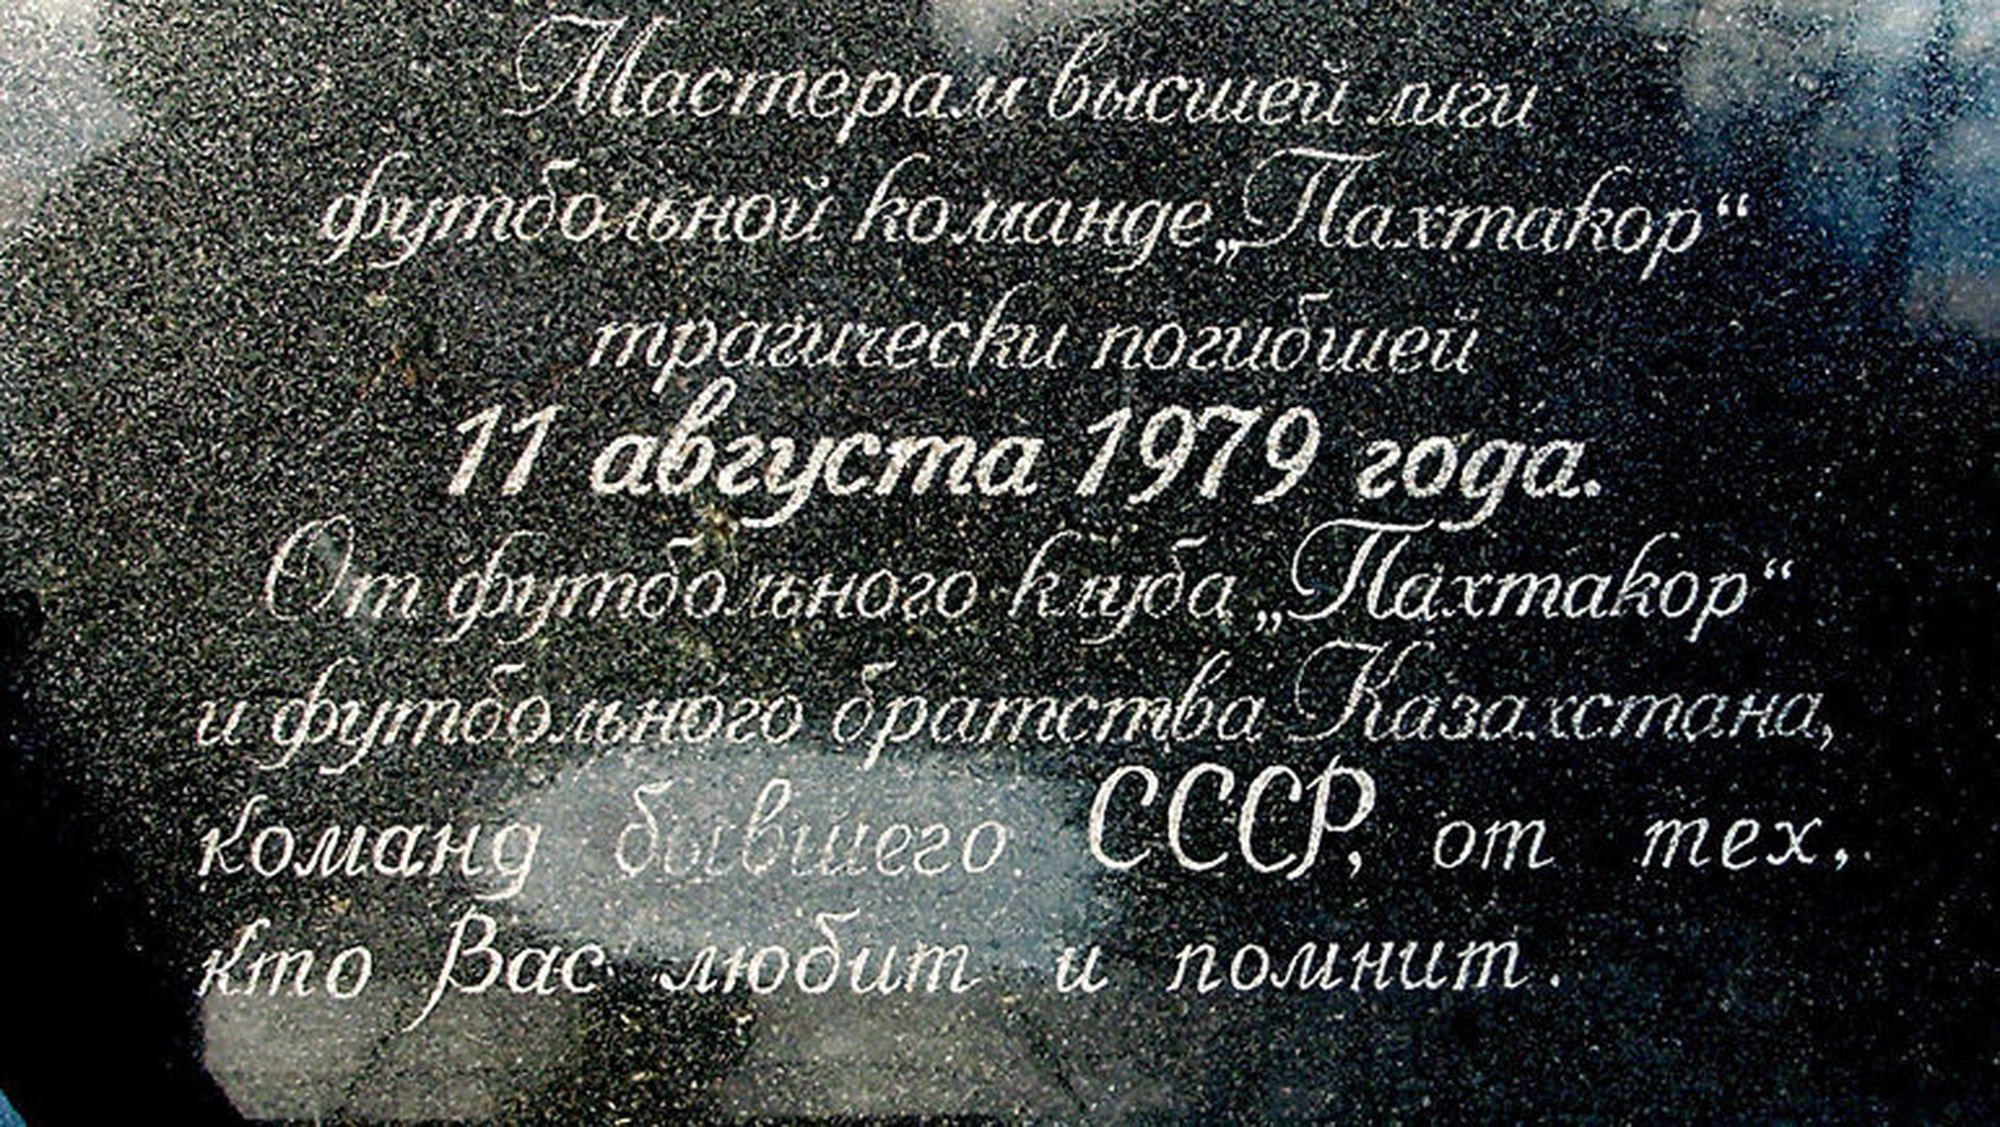 memorial-v-pamyat-o-pogibshih-igrokah-i-rabotnikah-pahtakora